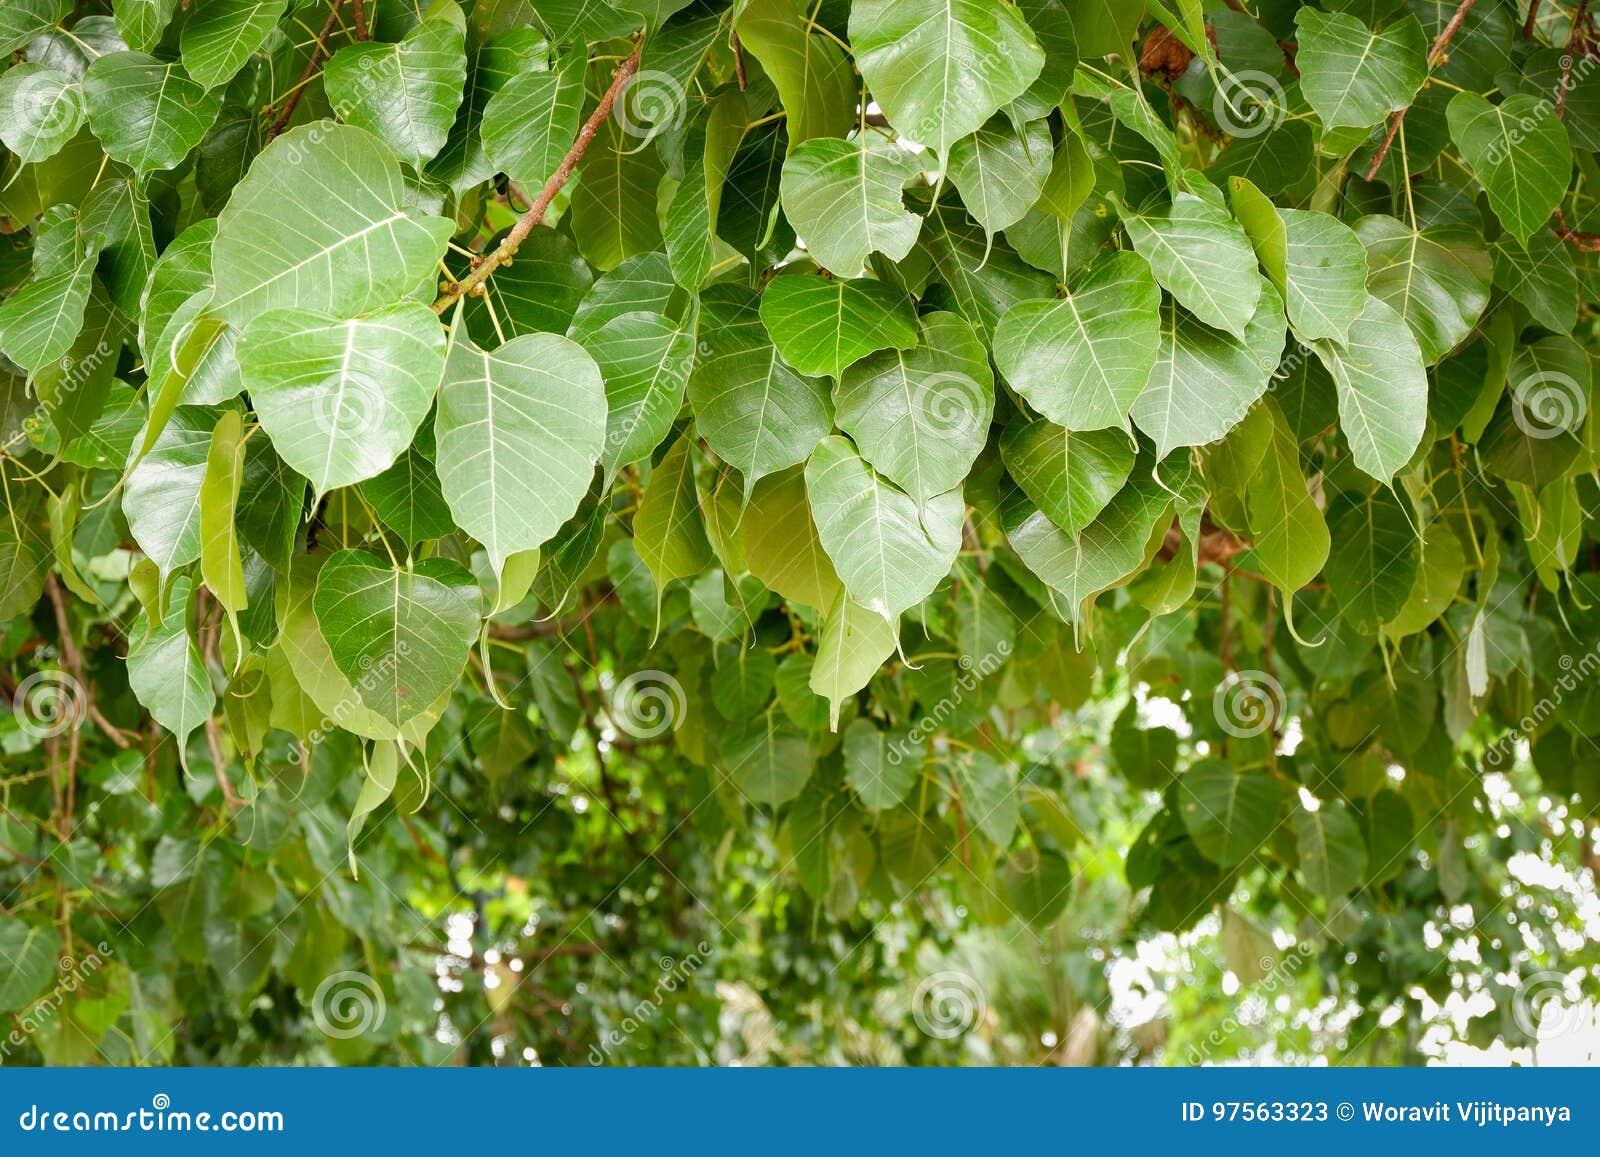 Leaves bodhi tree